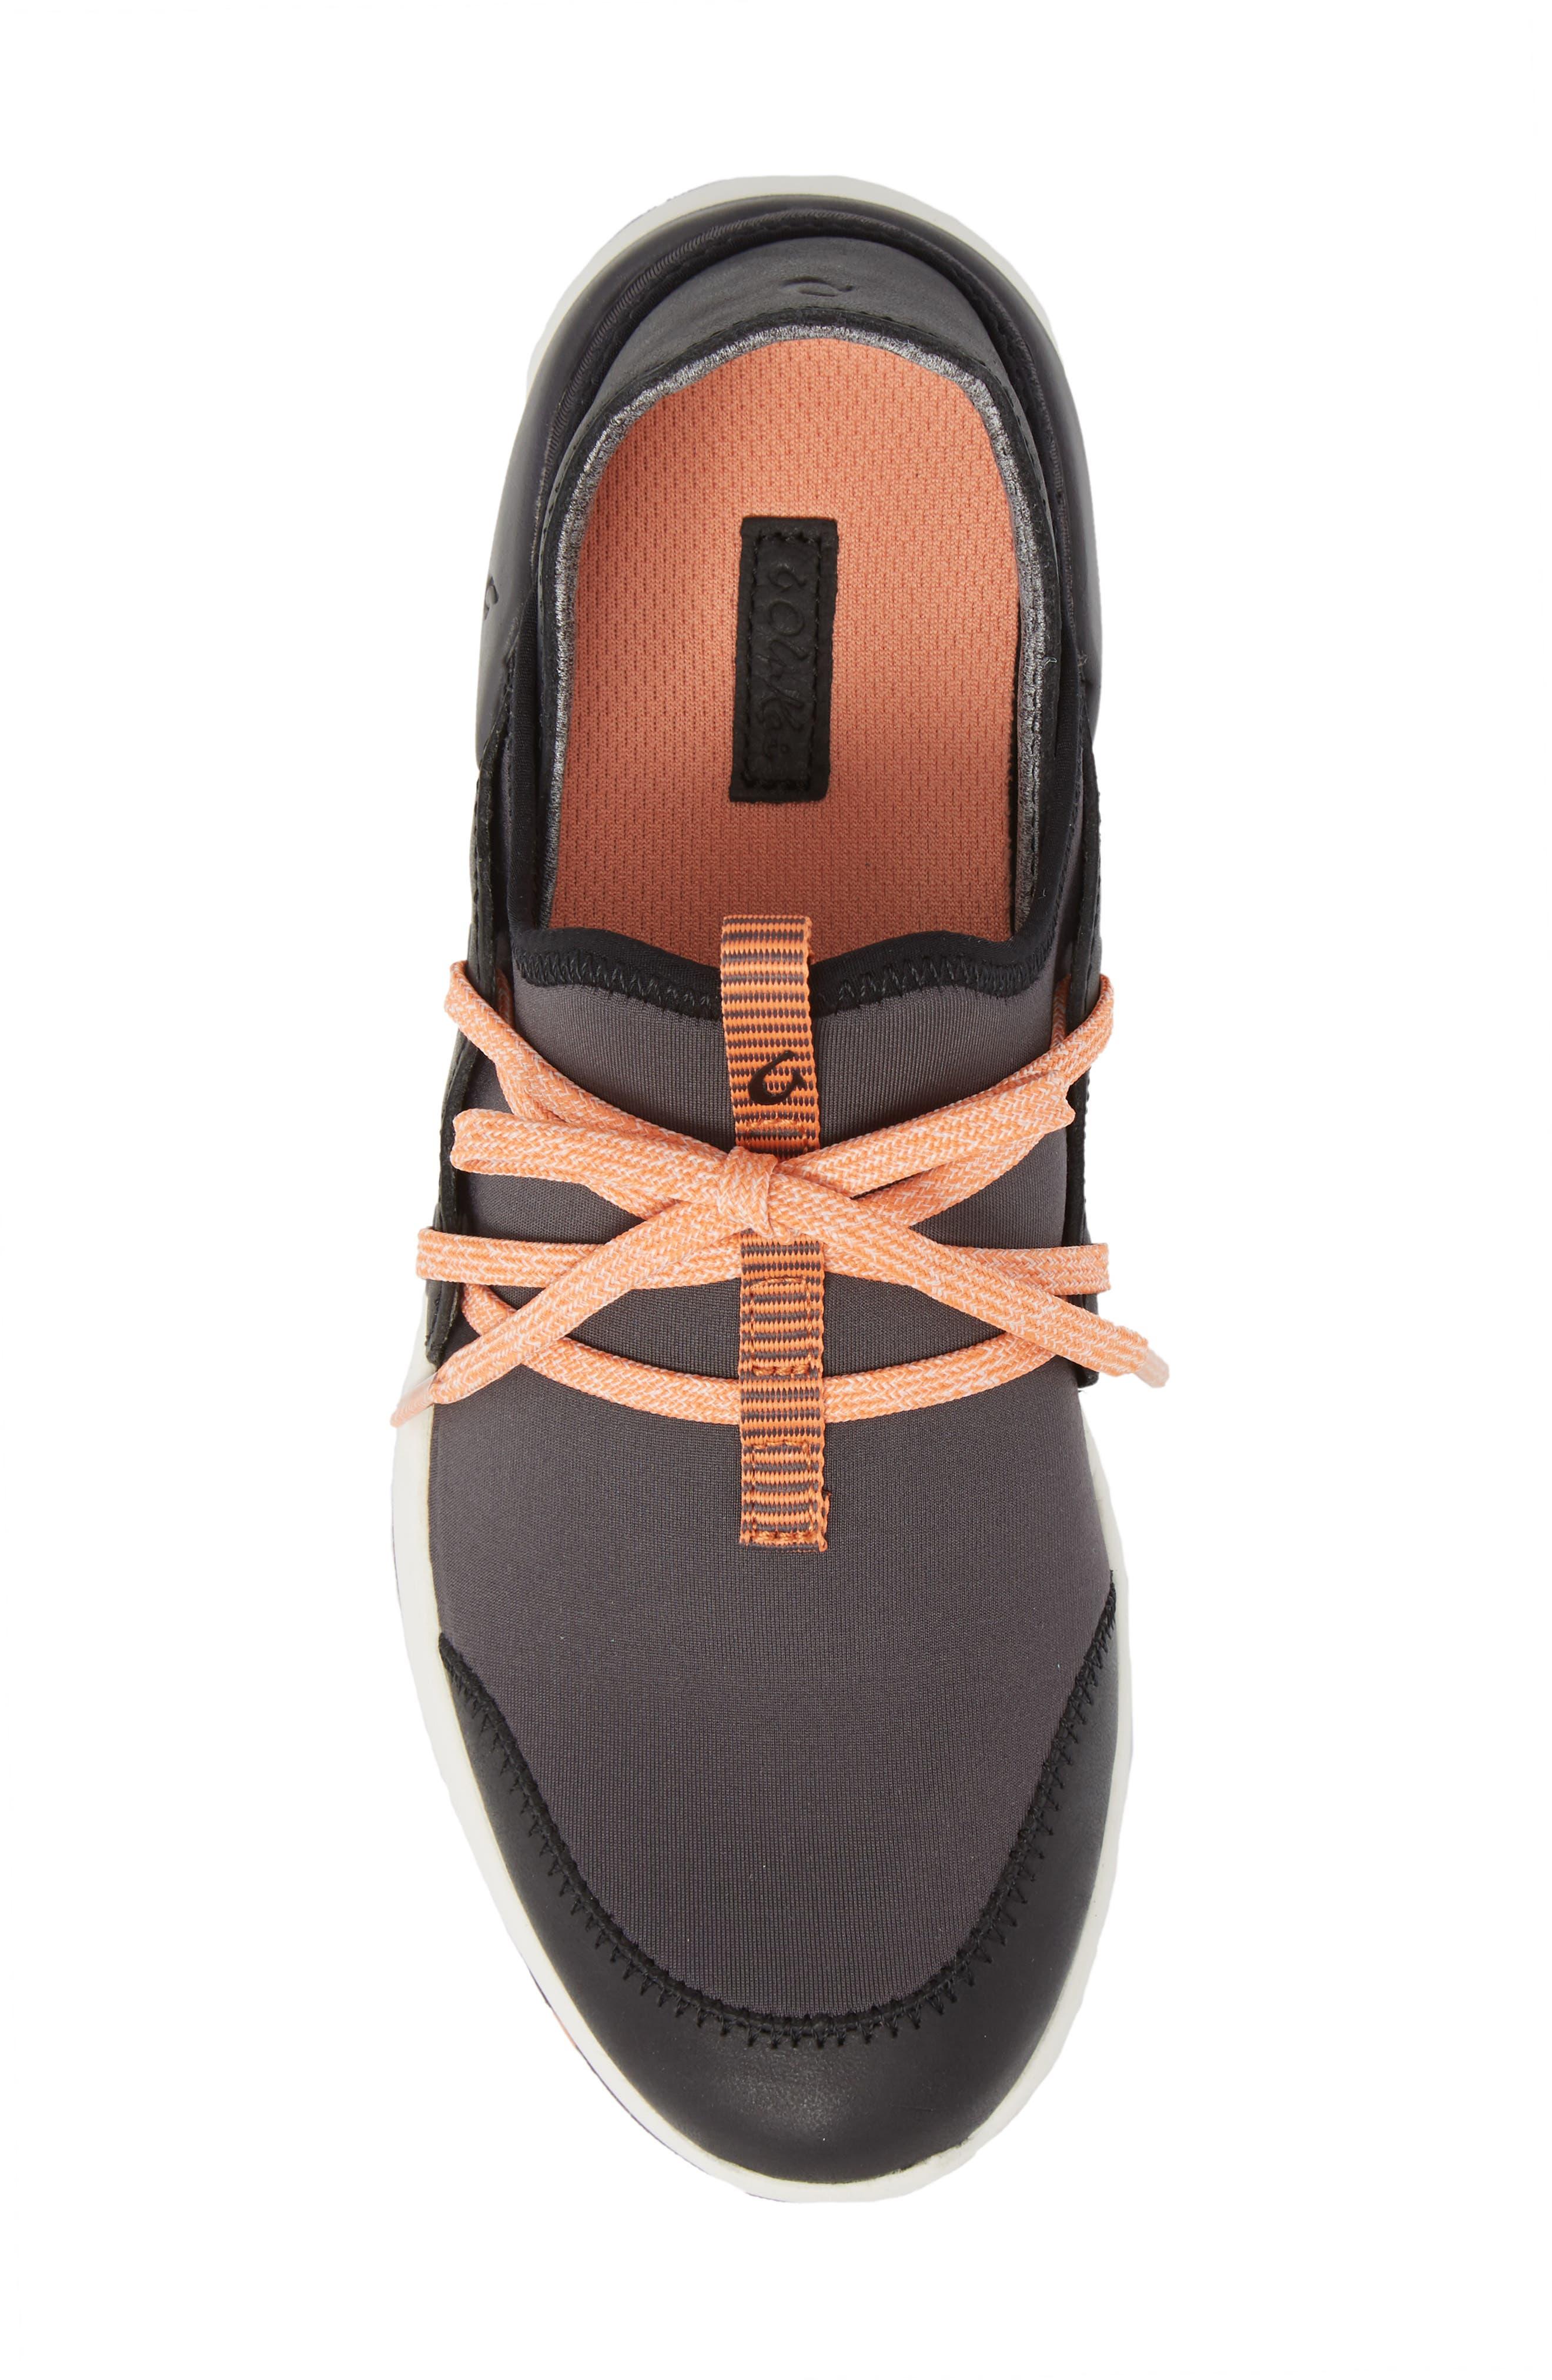 Miki Li Convertible Sneaker,                             Alternate thumbnail 5, color,                             PAVEMENT/ BLACK FABRIC